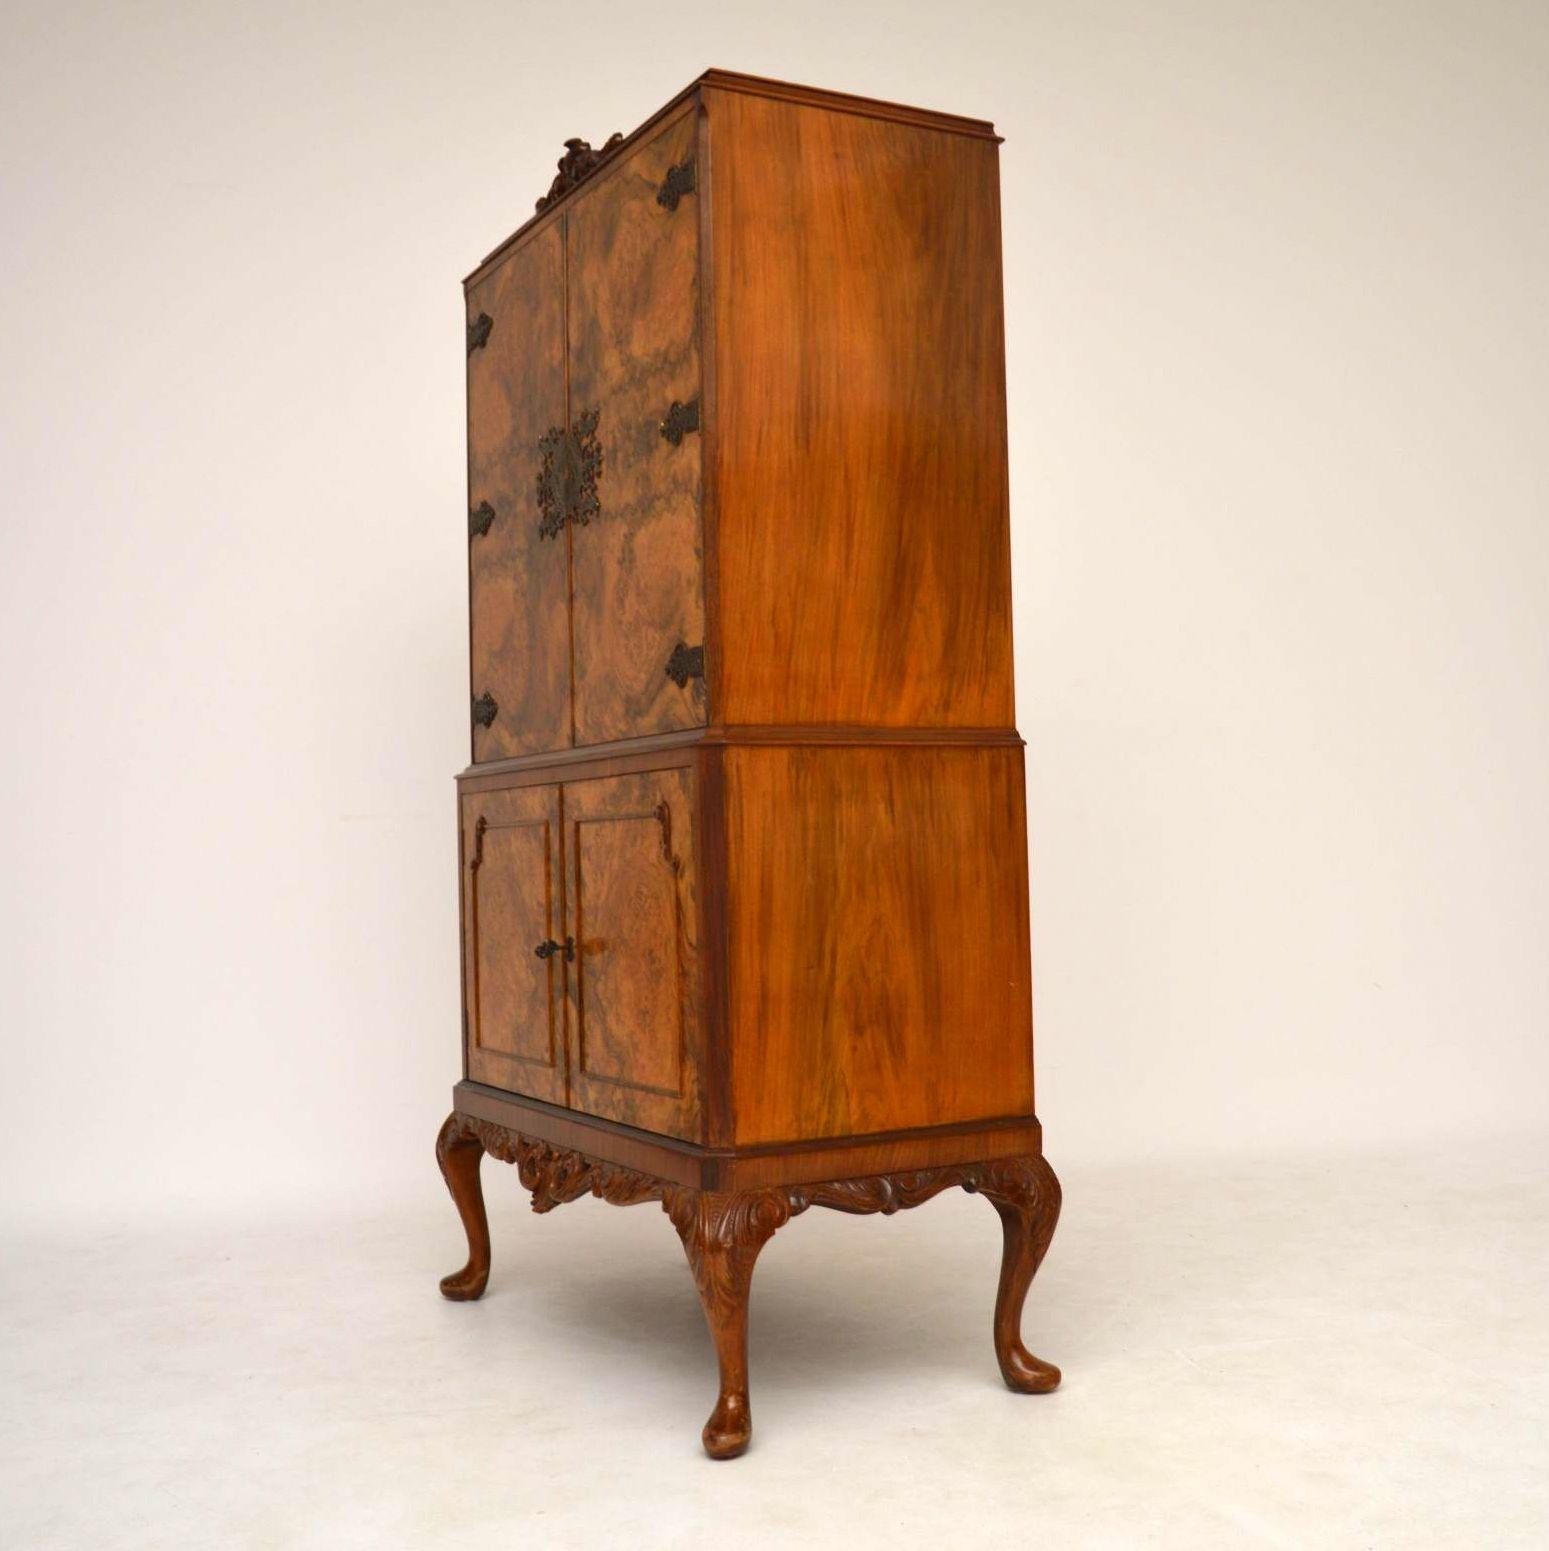 antique burr walnuss cocktail getr nke schrank vorratsschrank. Black Bedroom Furniture Sets. Home Design Ideas